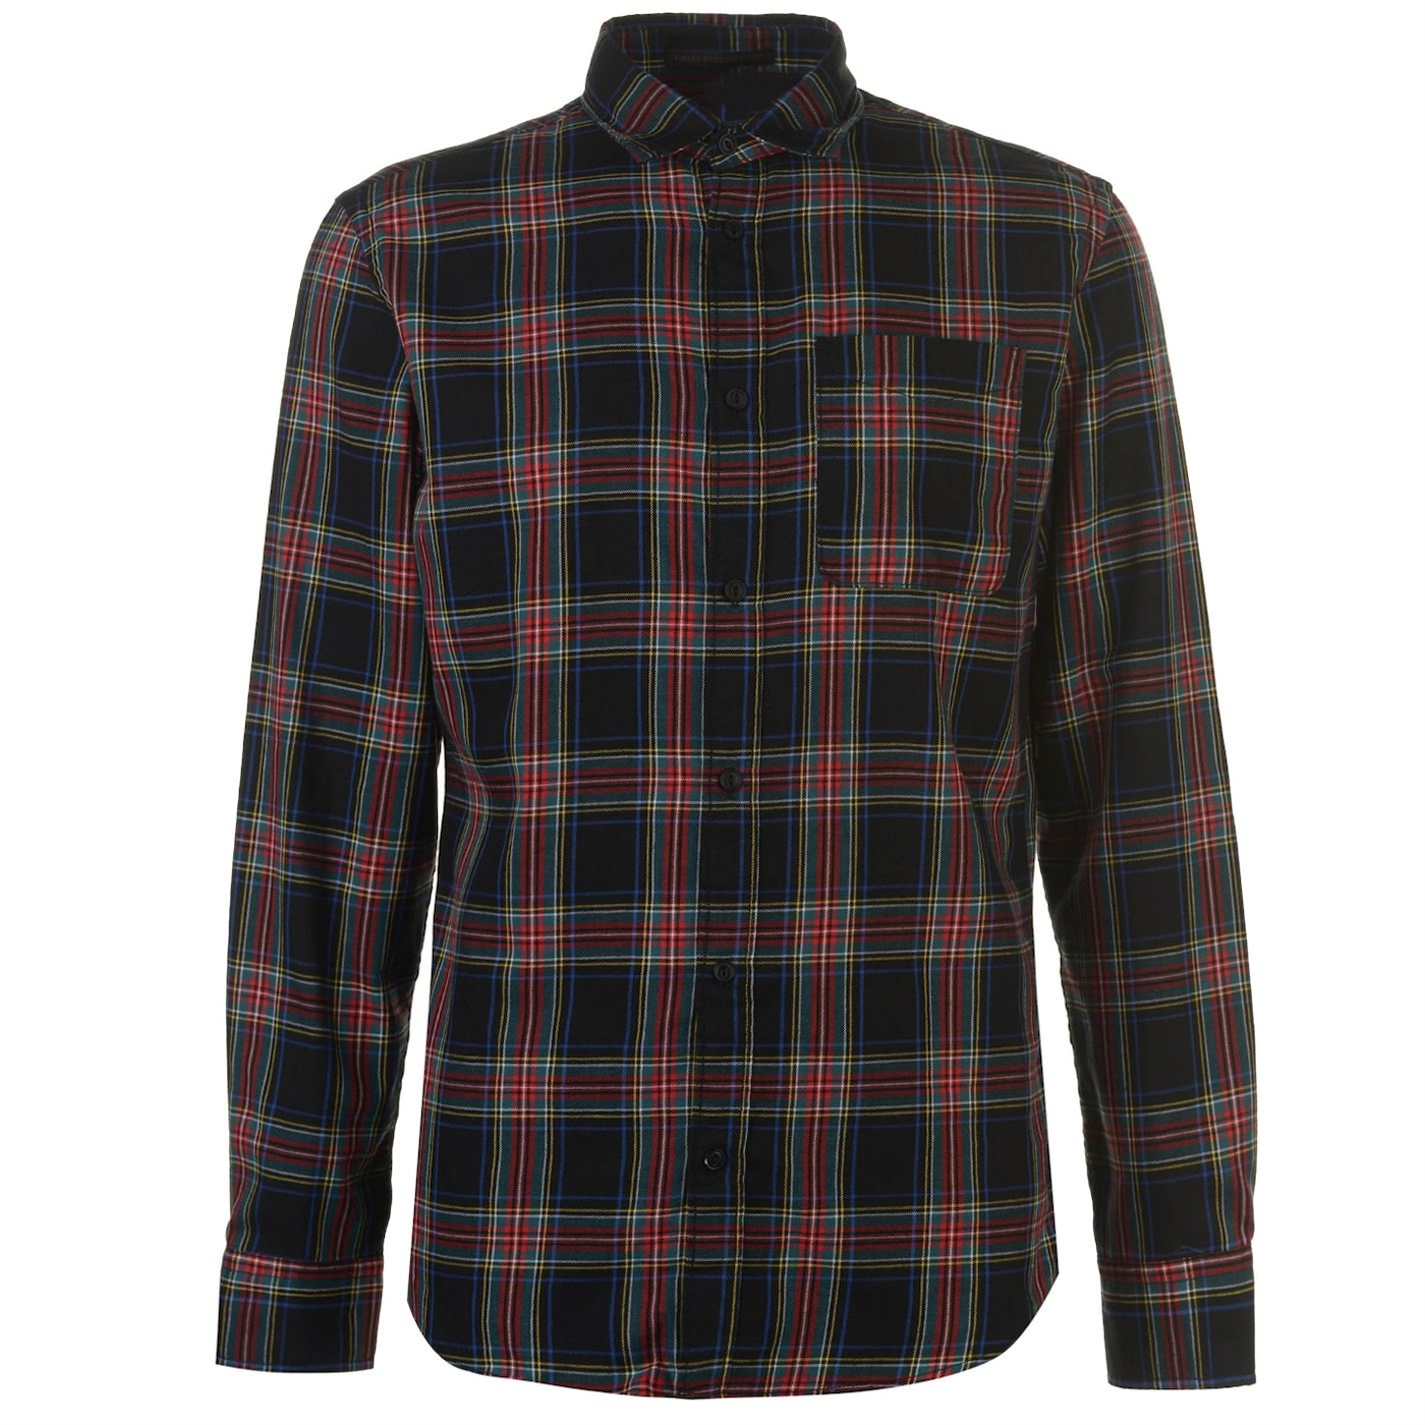 Jack and Jones Original Legacy Long Sleeve Shirt